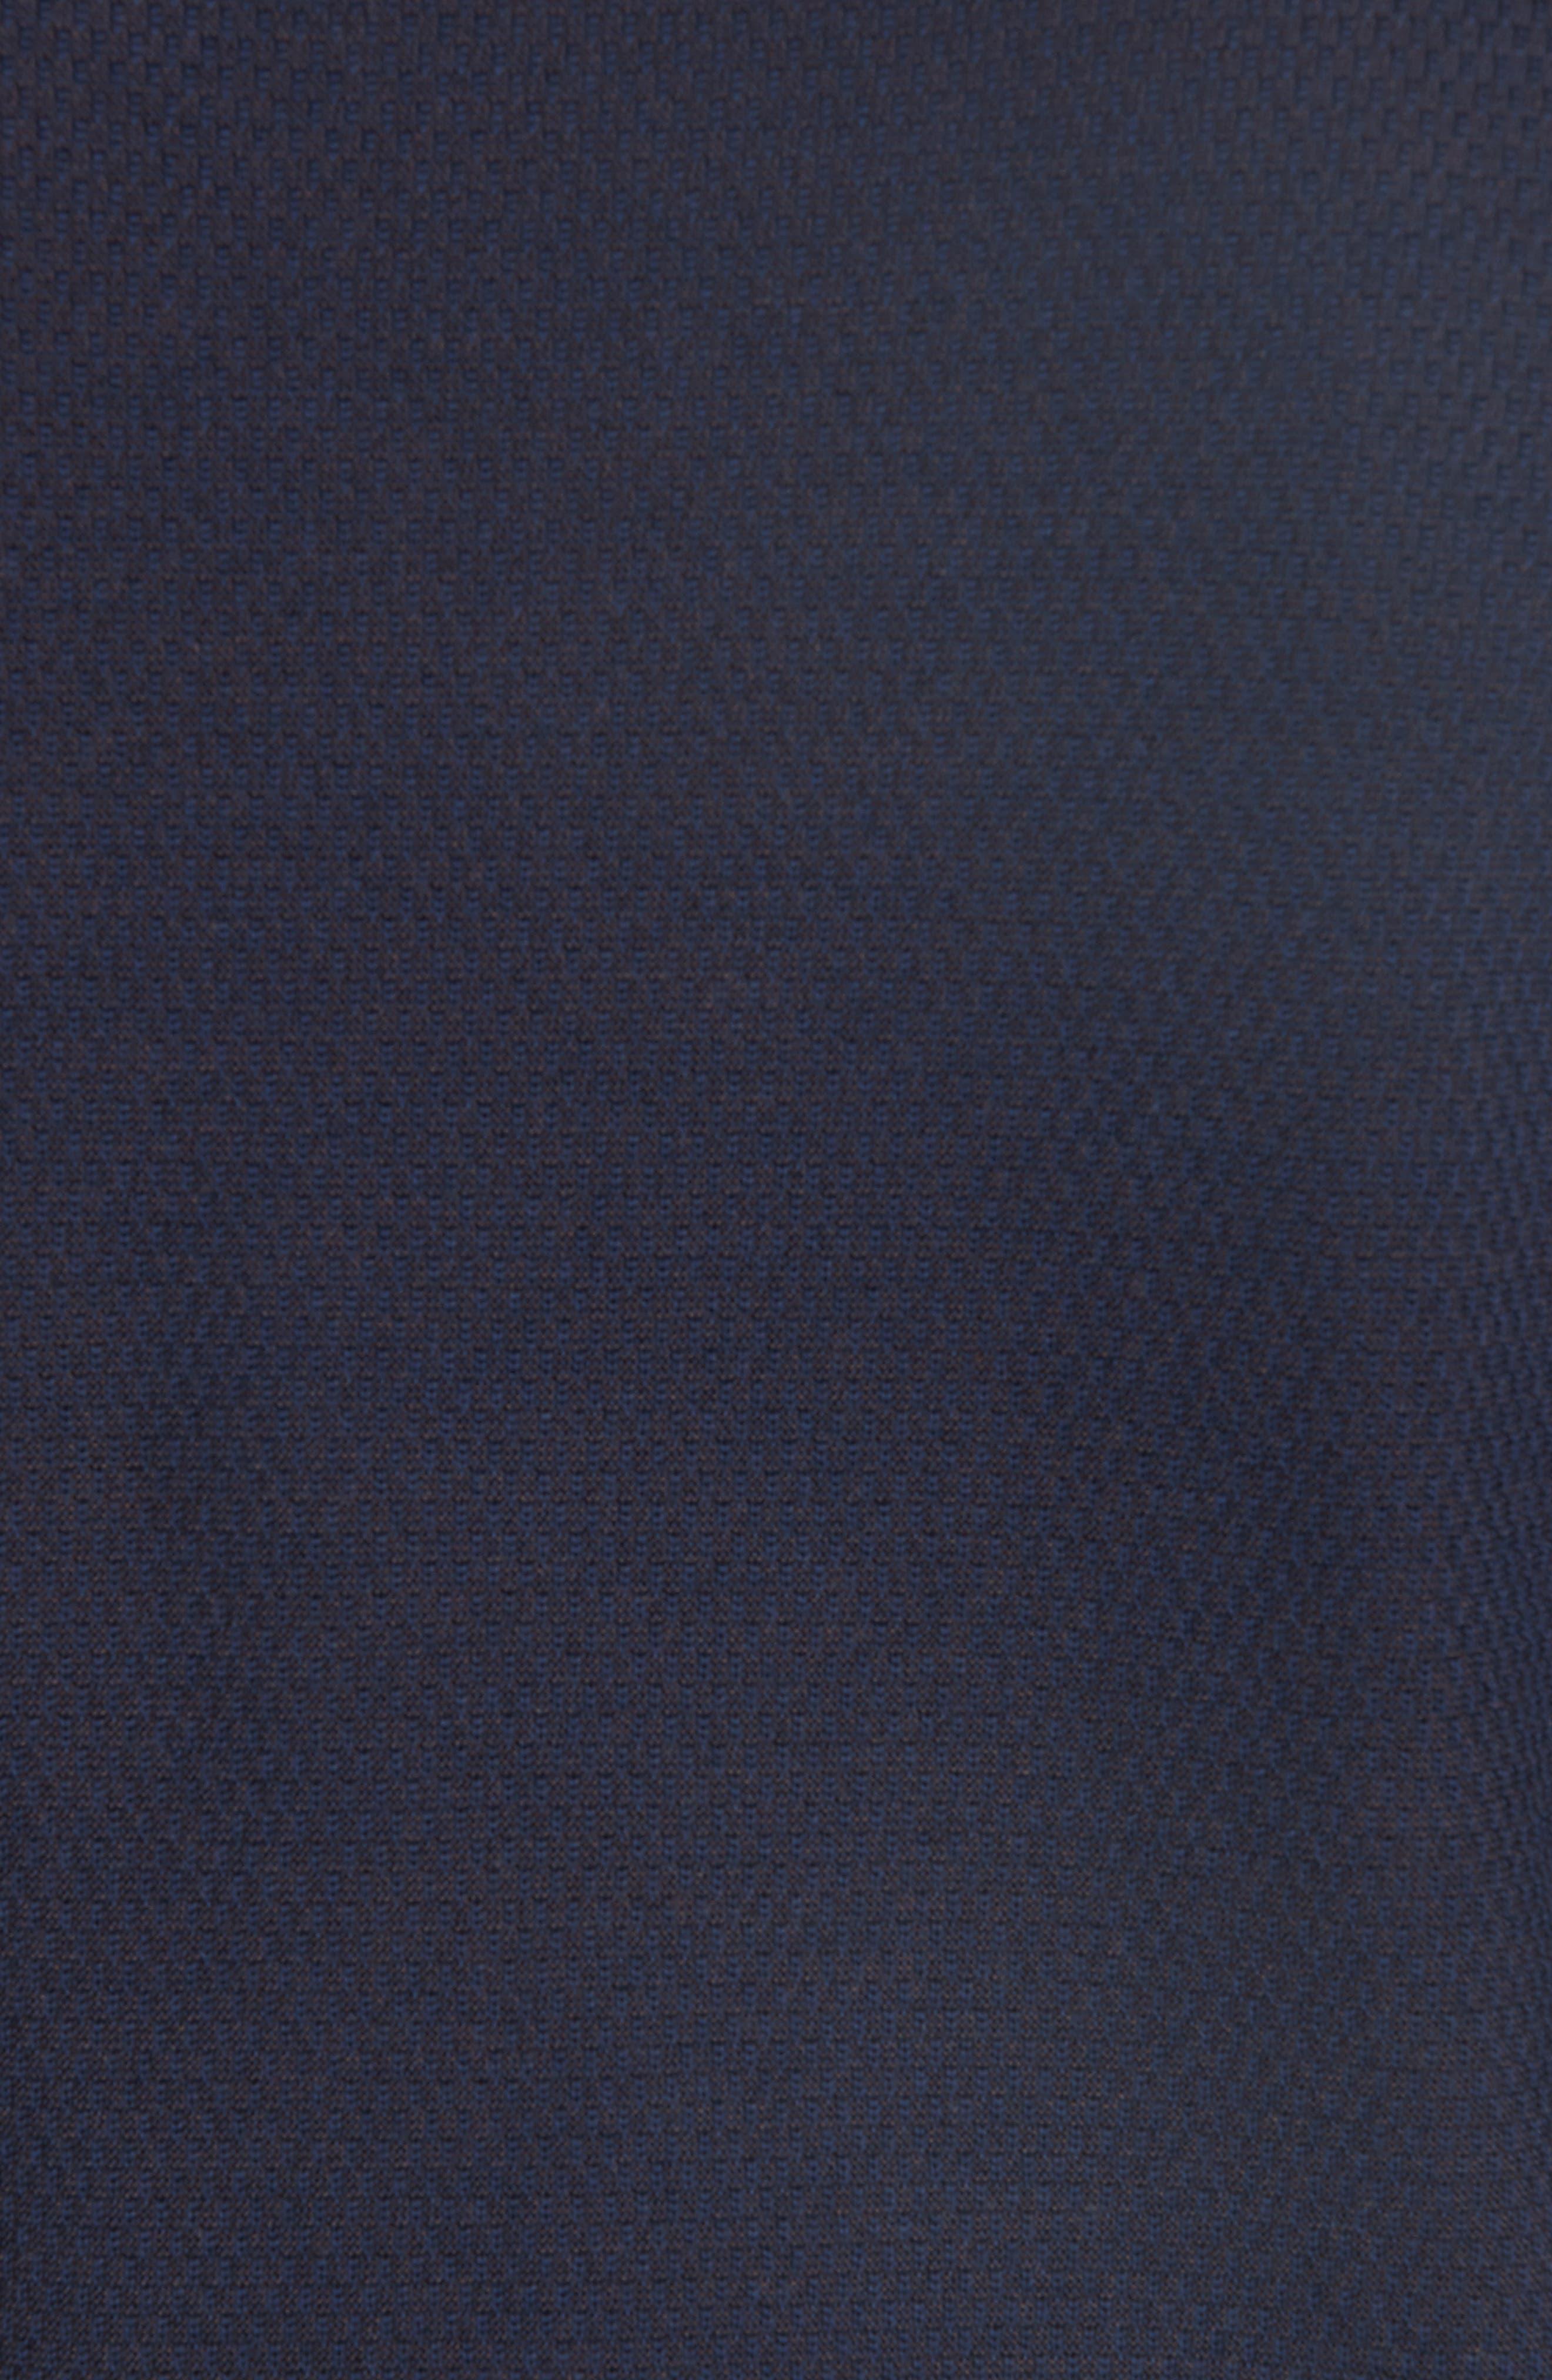 Crewneck Wool Sweater,                             Alternate thumbnail 5, color,                             NAVY